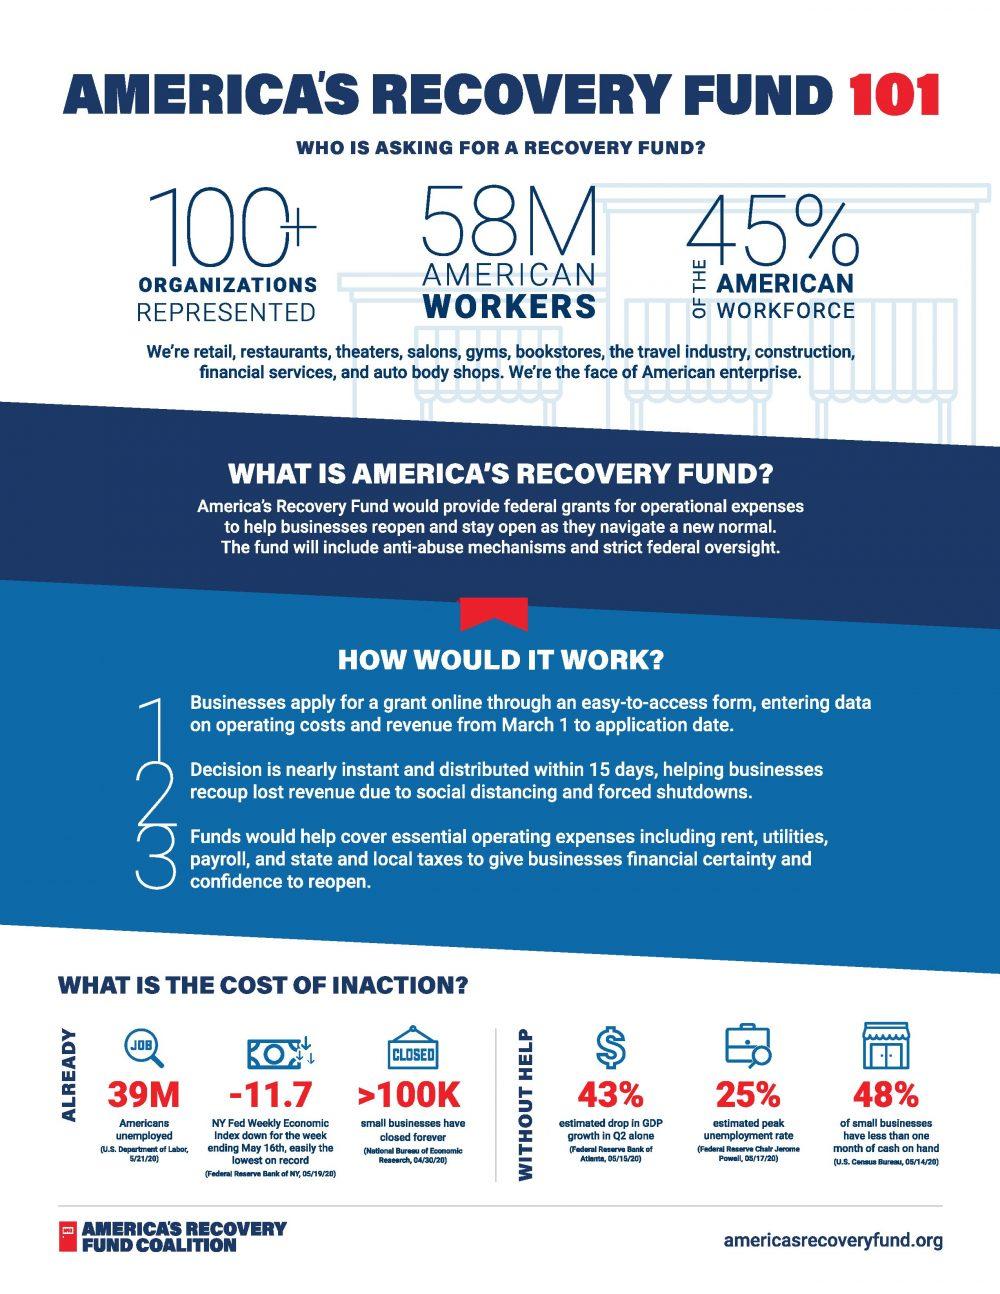 ARFC Infographic